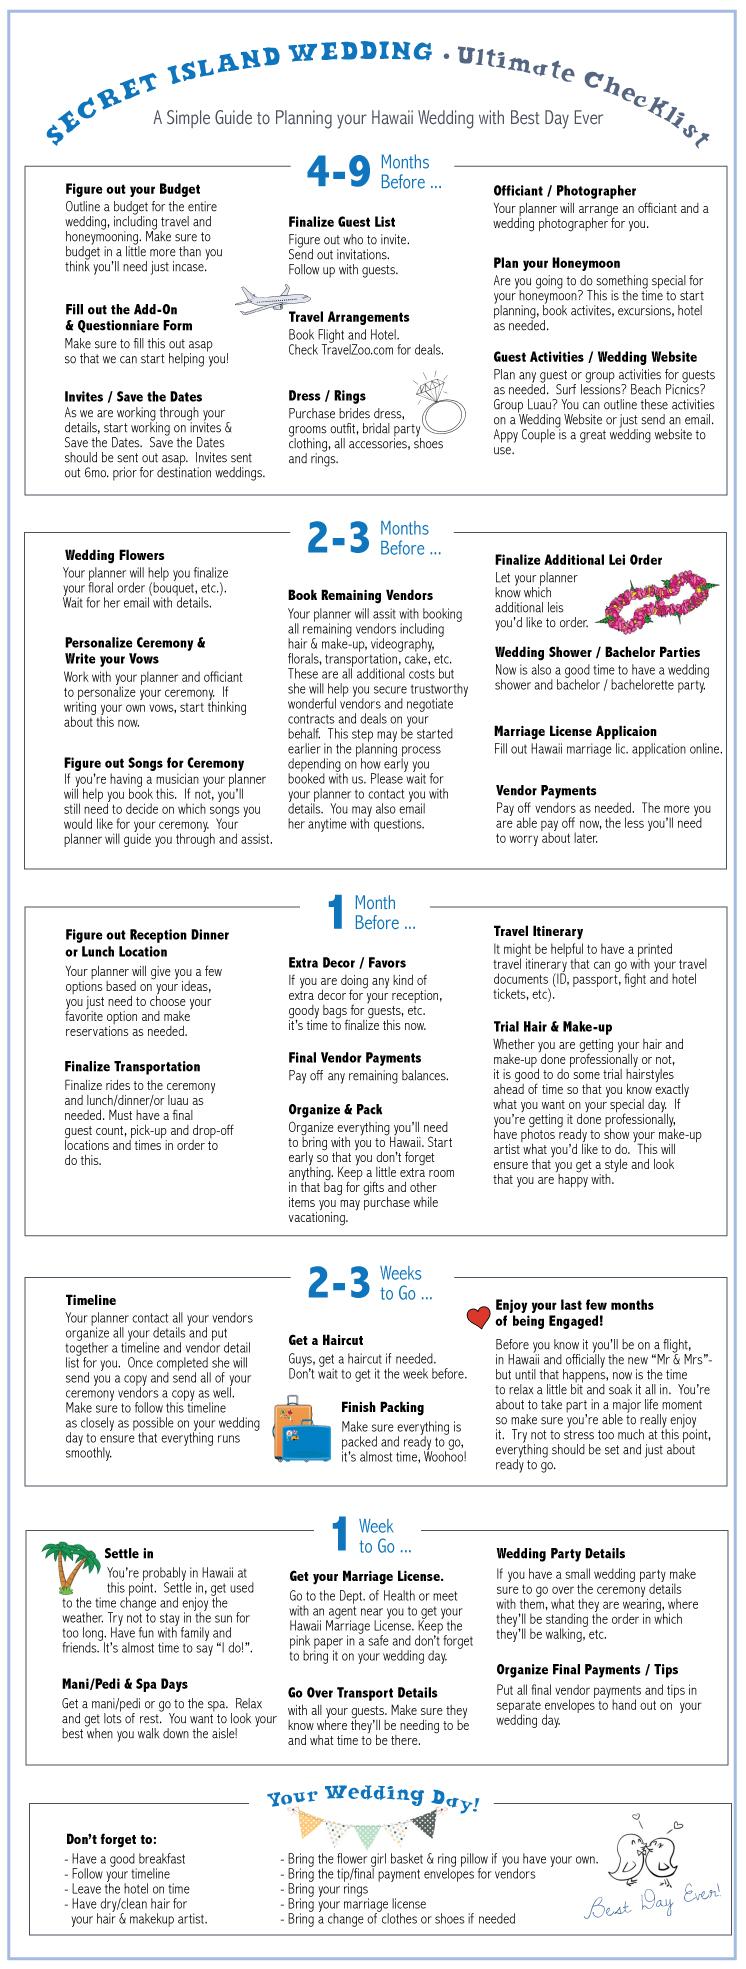 secret-island-checklist.jpg